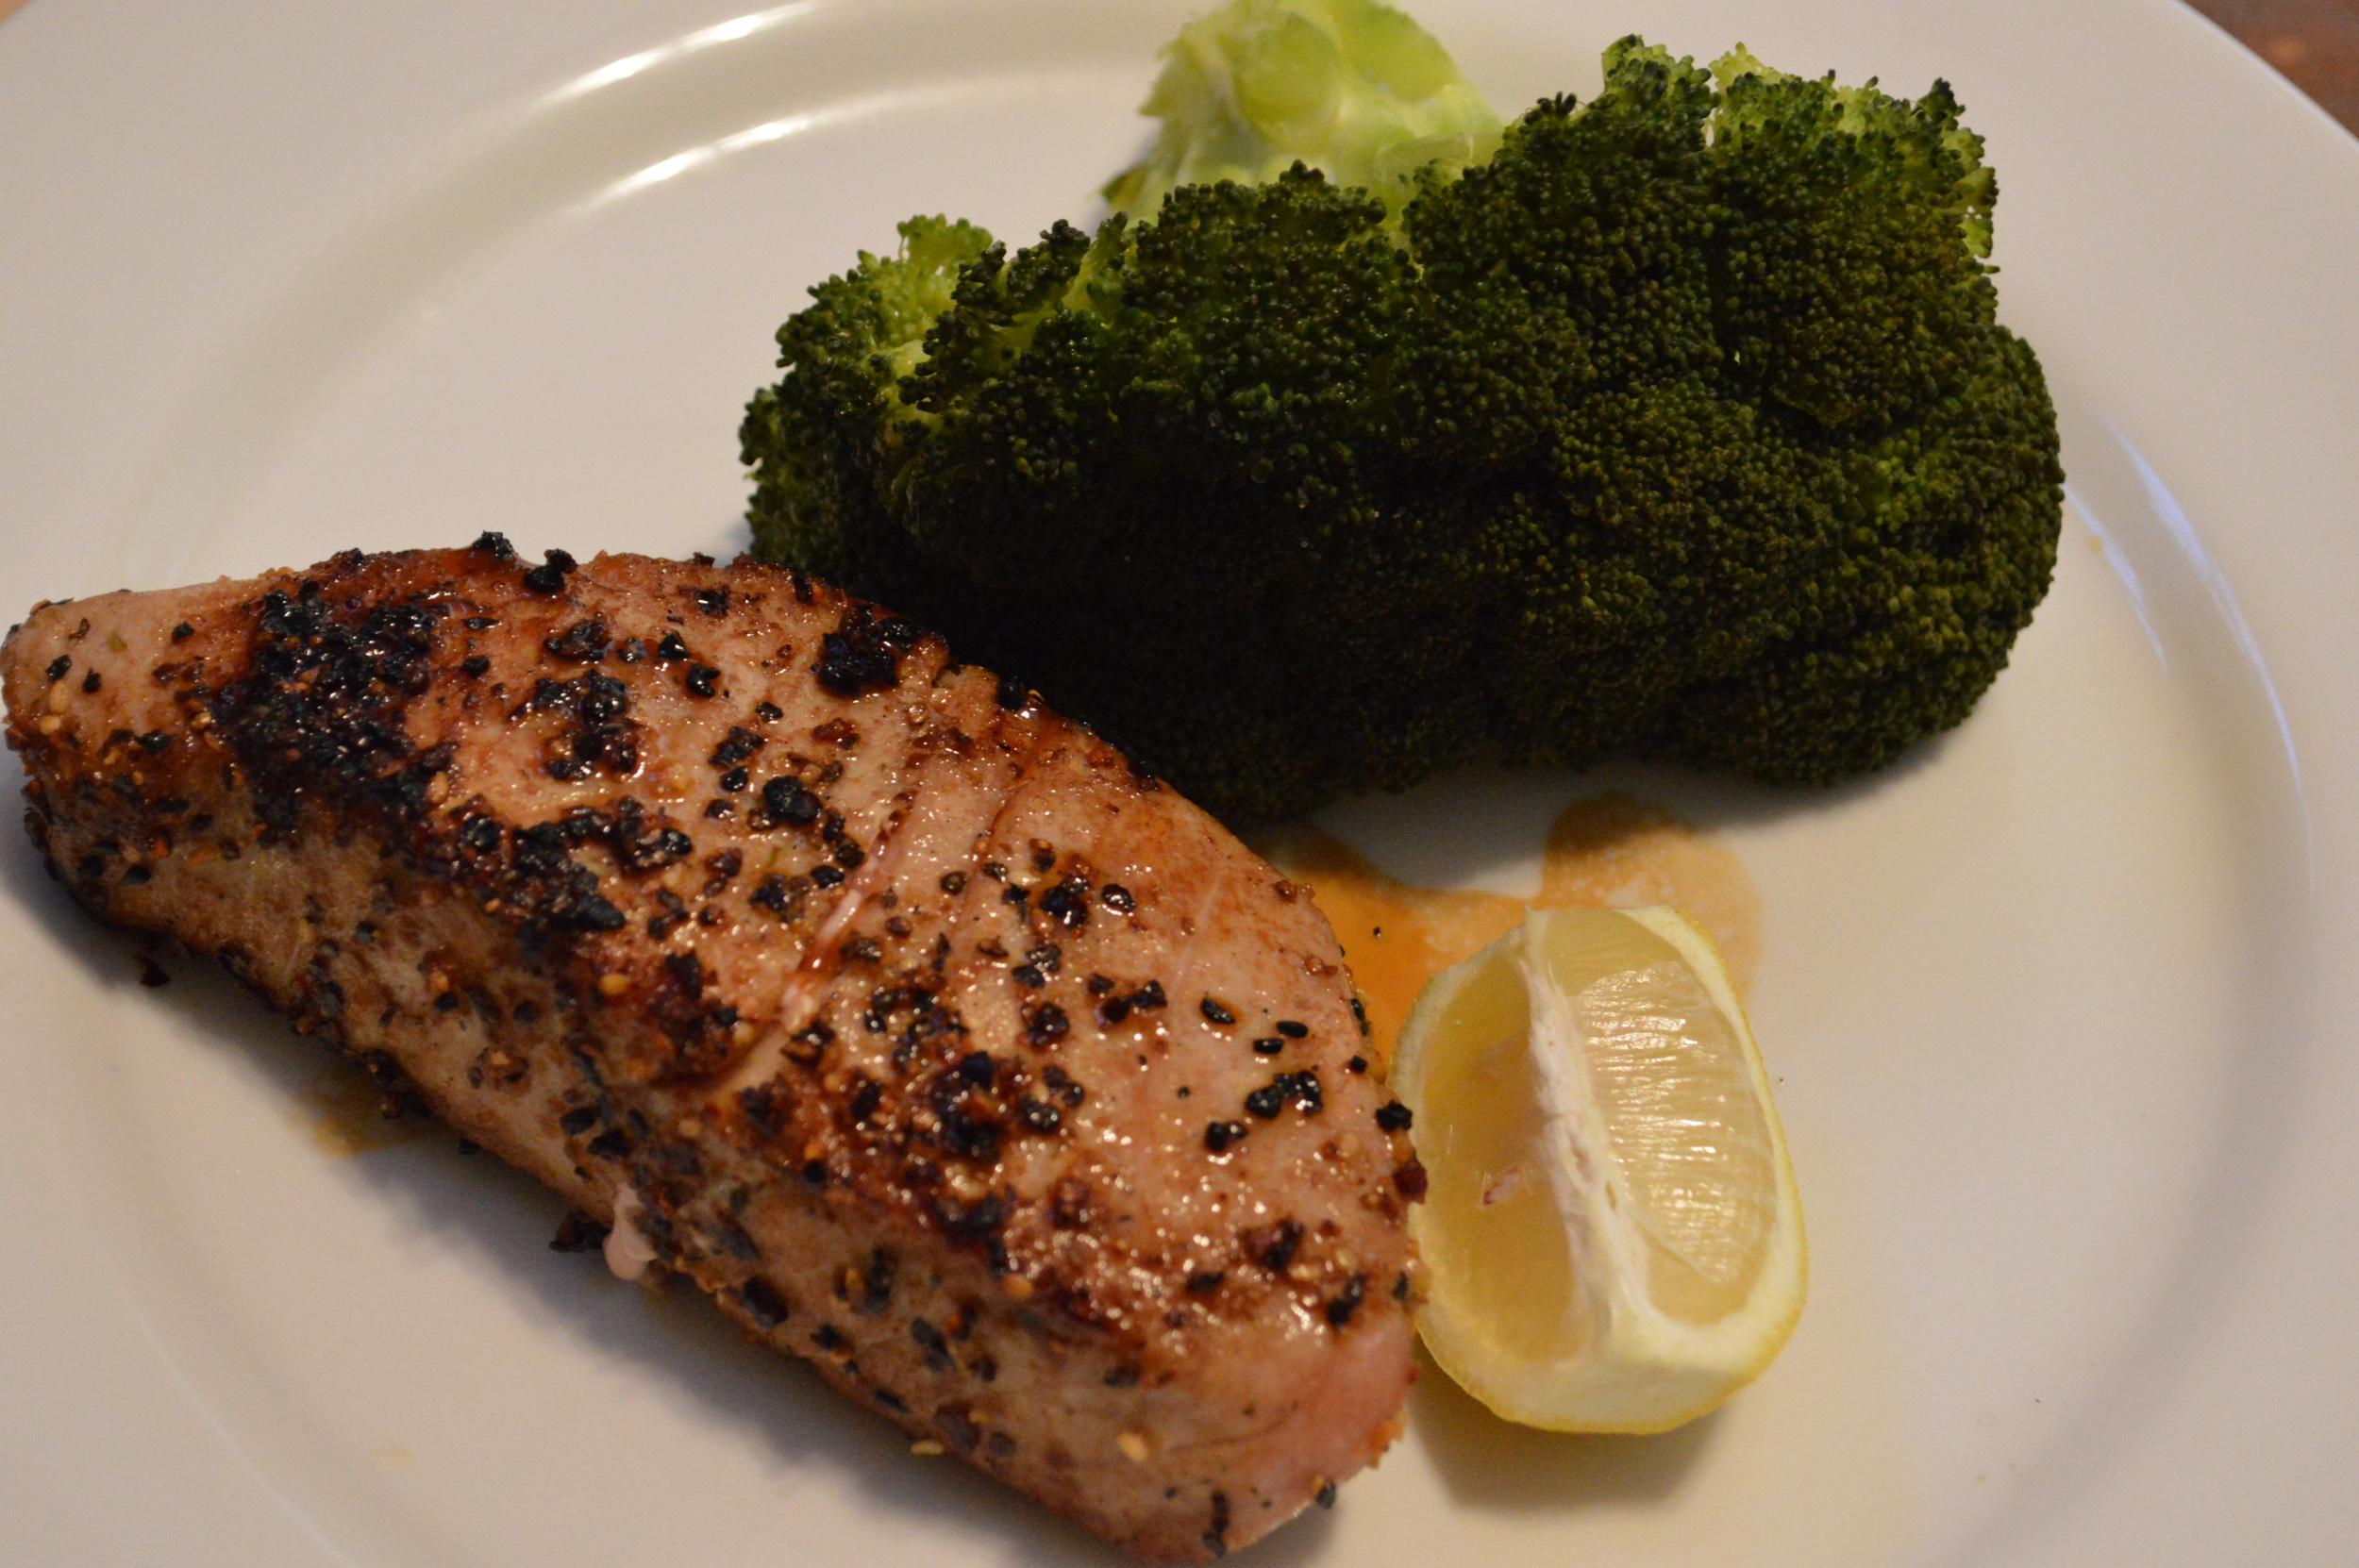 Seared Tuna & Broccoli